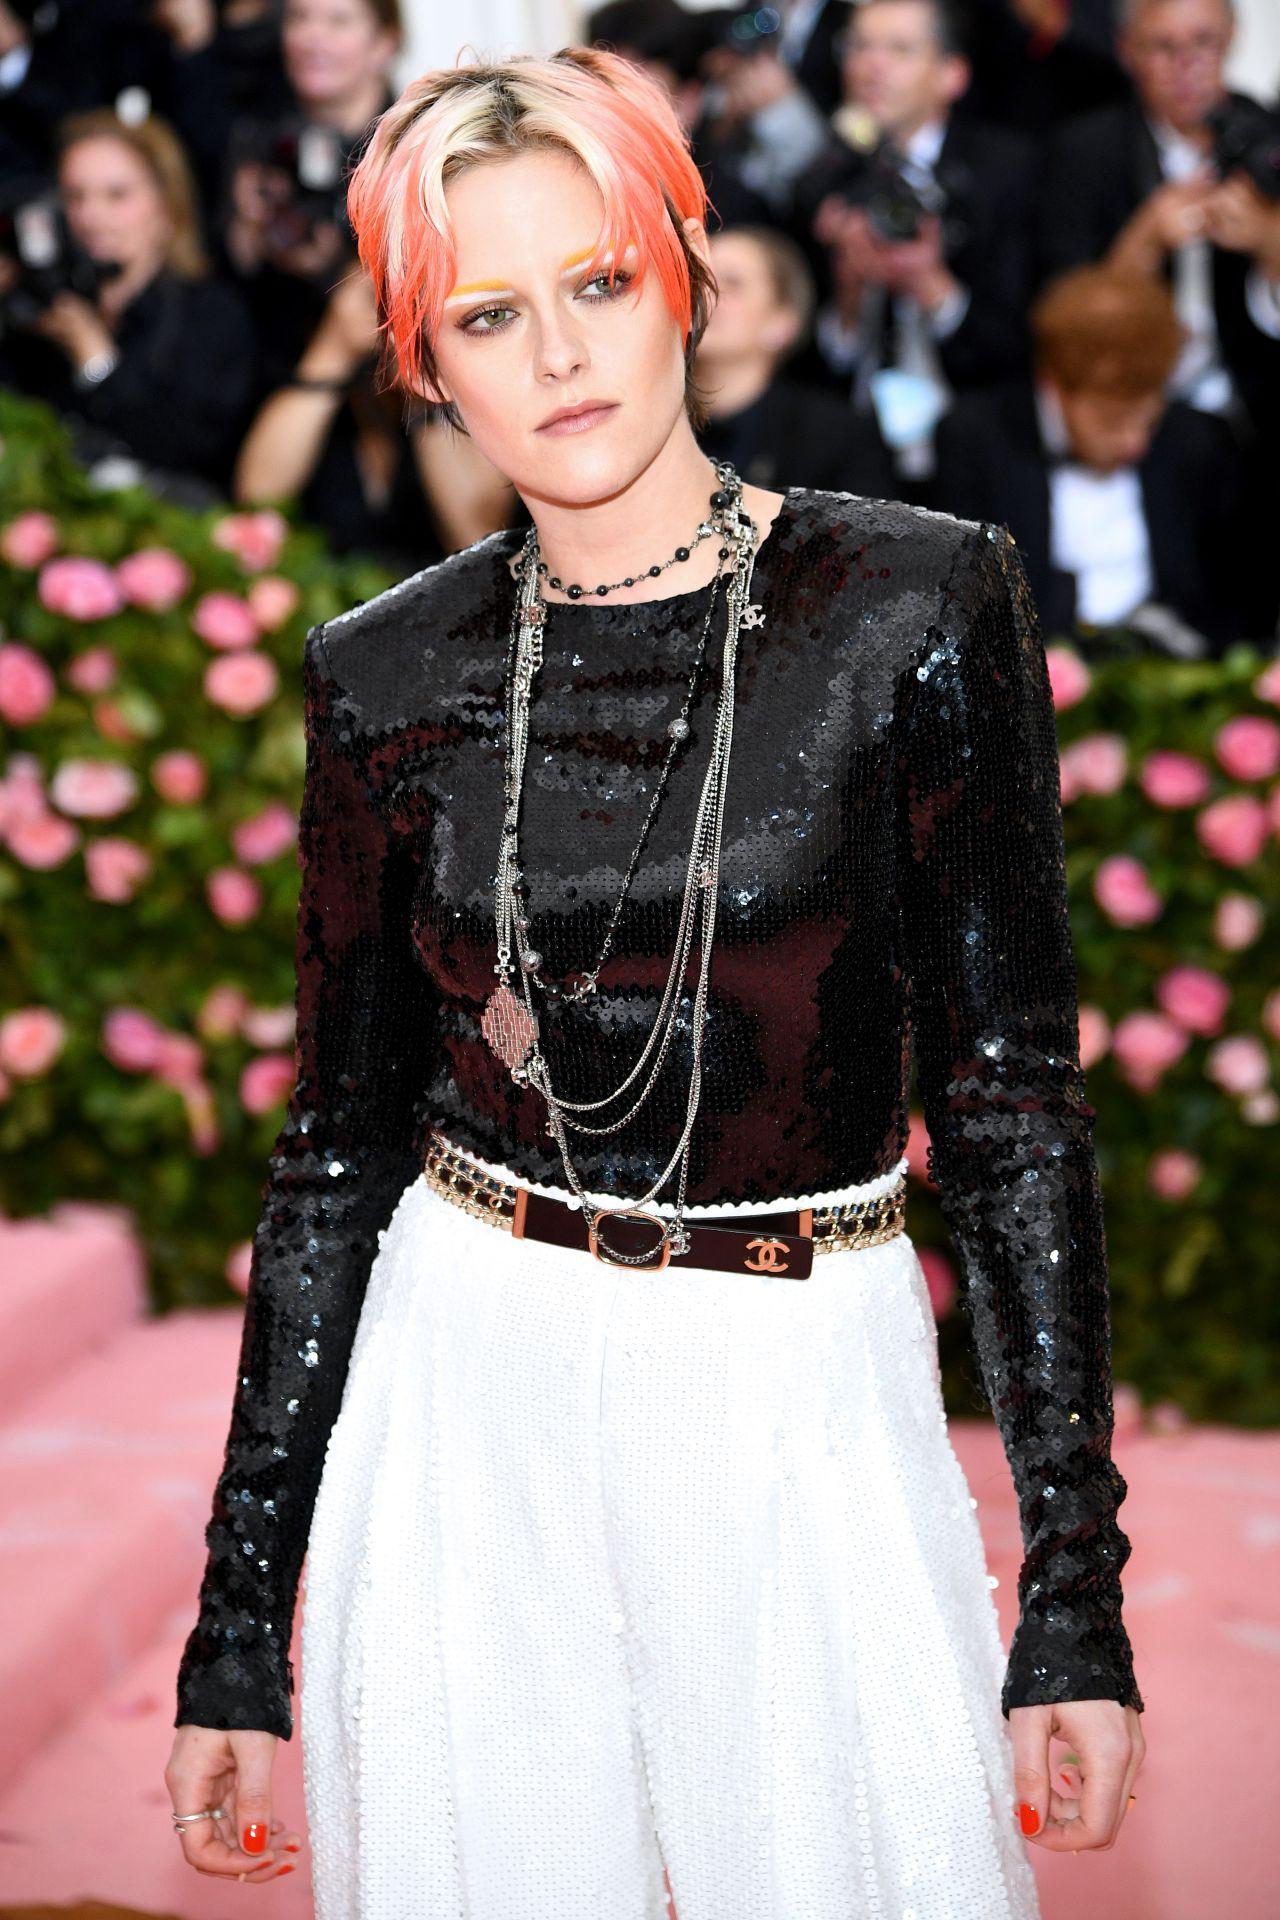 Kristen Stewart - 2019 Met Gala • CelebMafia